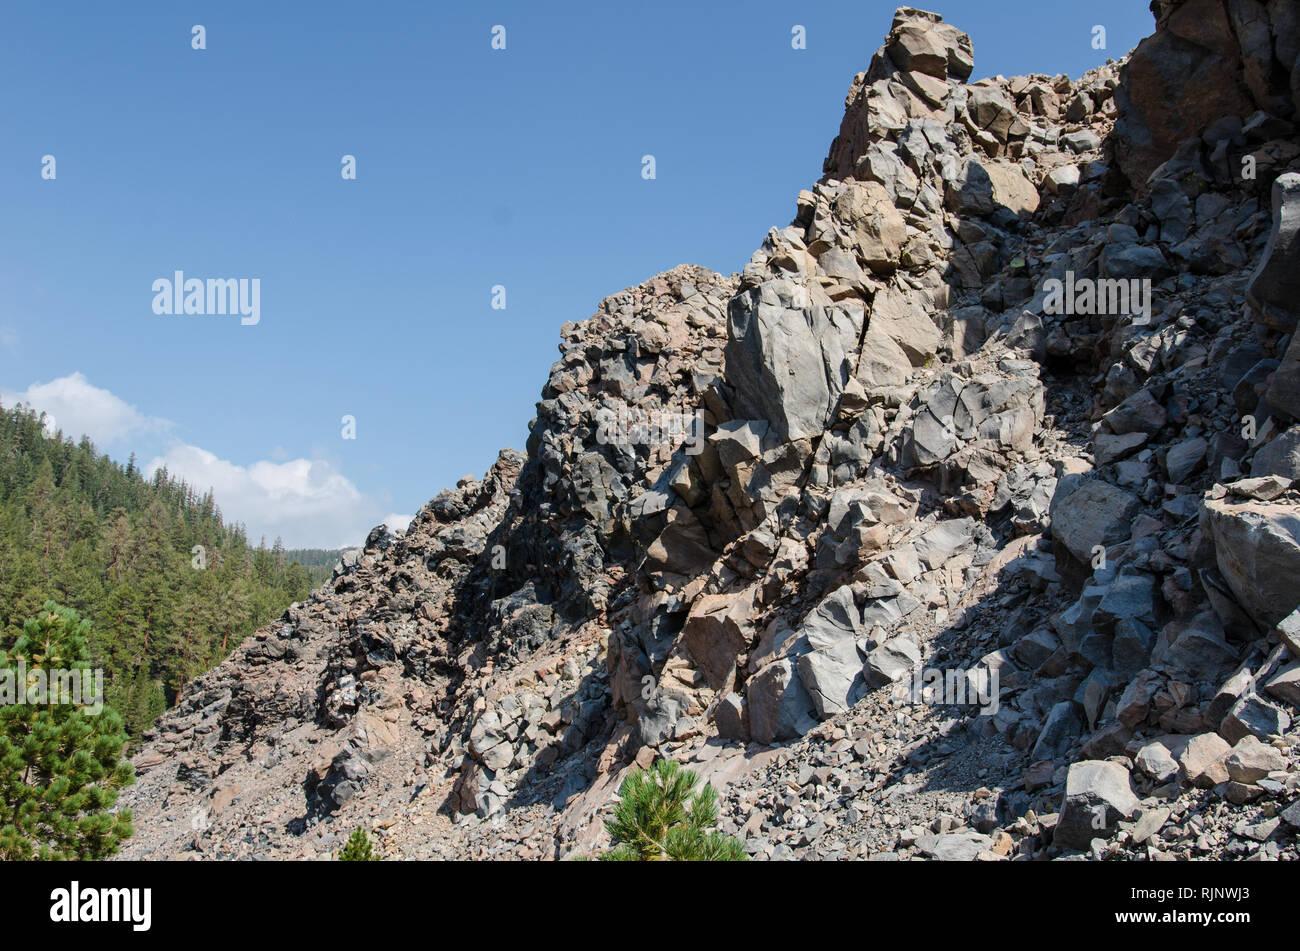 Obsidian Dome in California - Stock Image